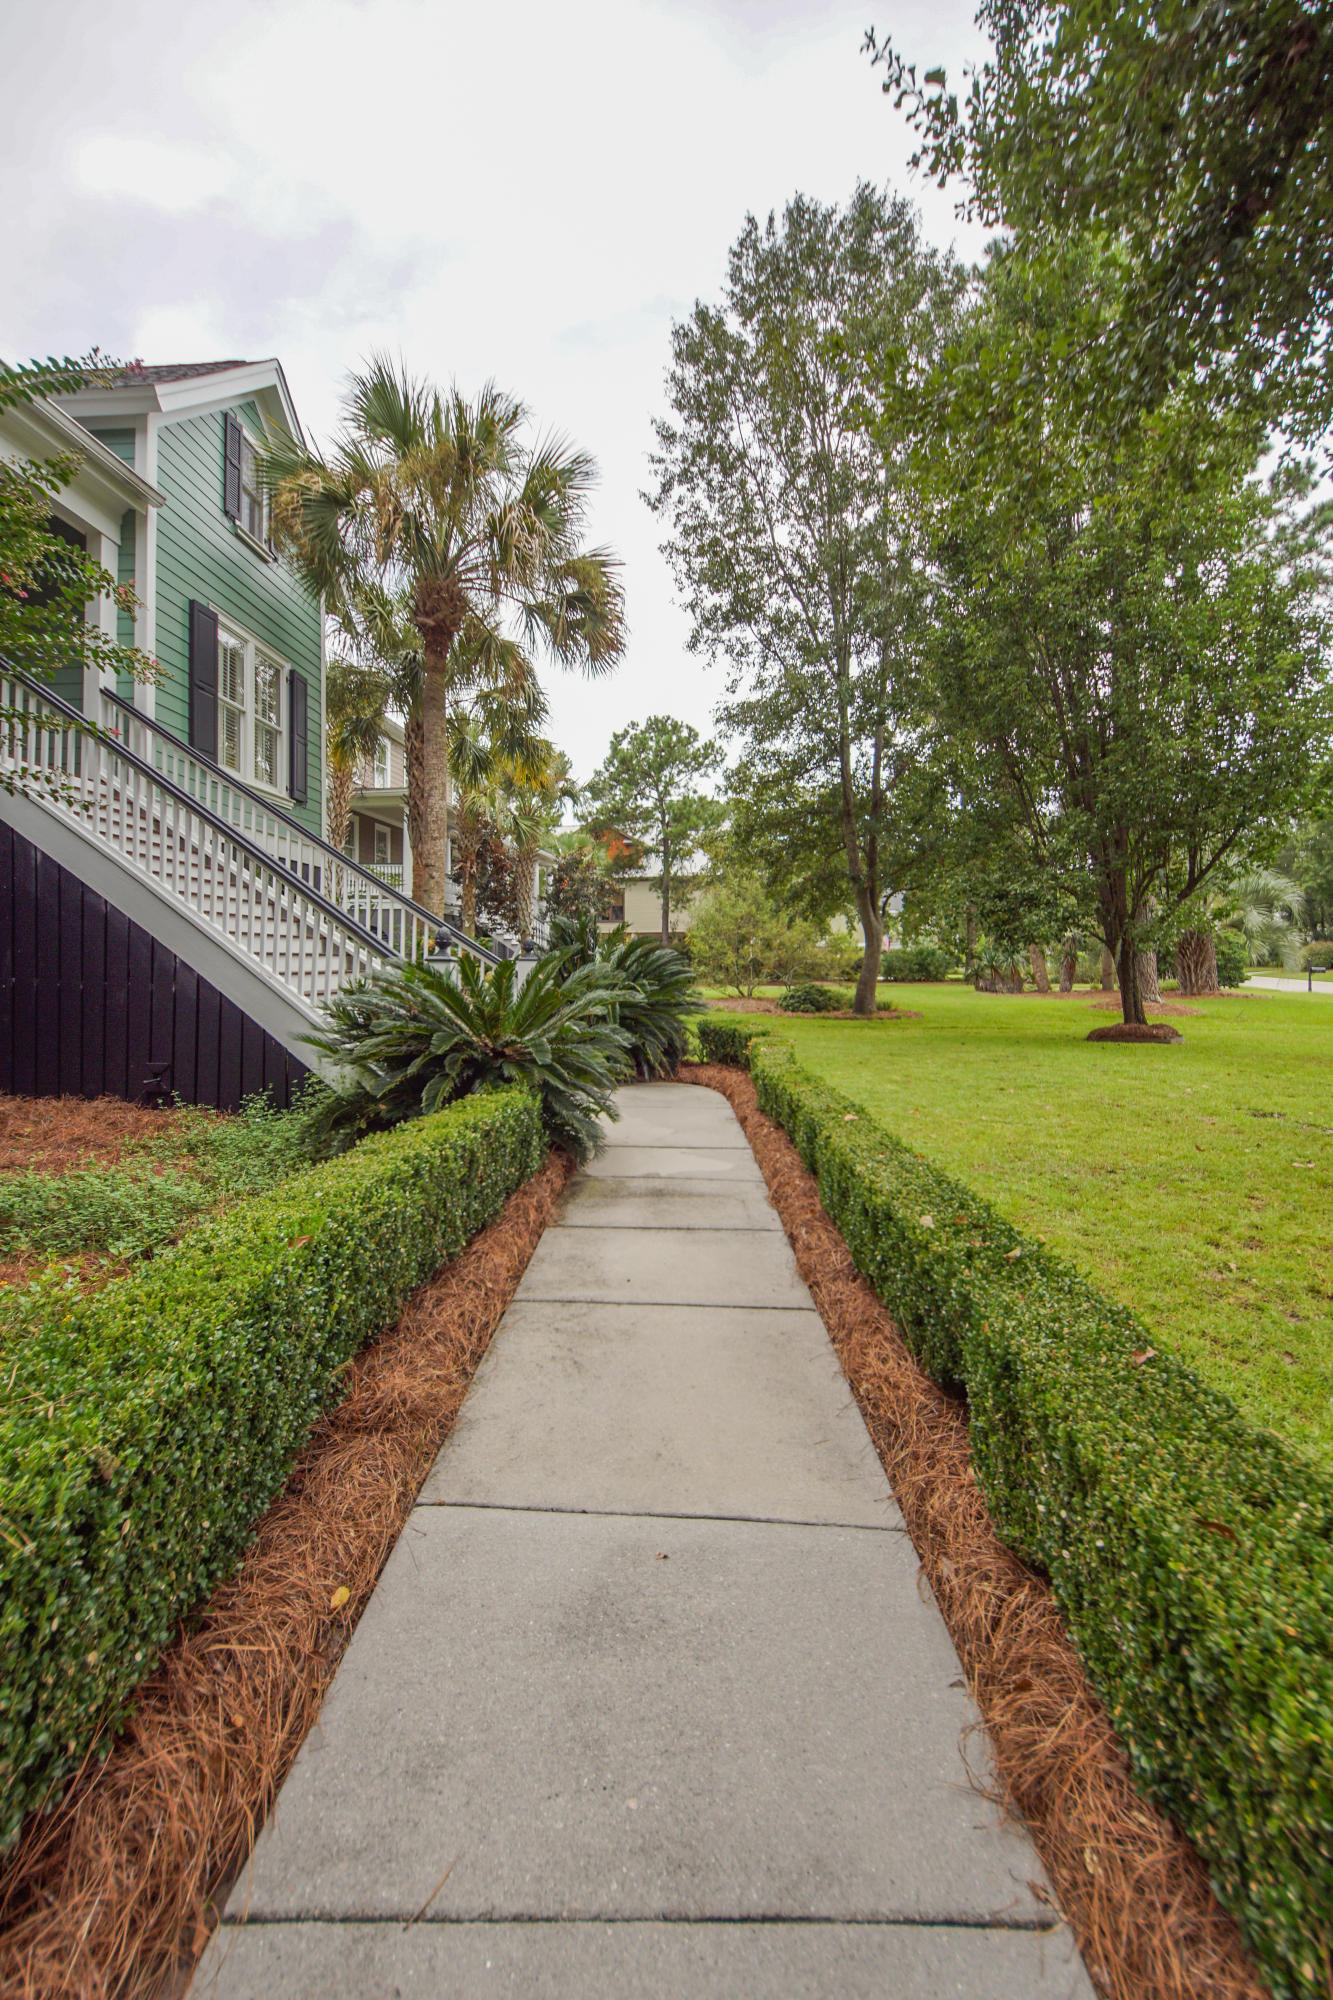 Grassy Creek Homes For Sale - 266 River Oak, Mount Pleasant, SC - 60